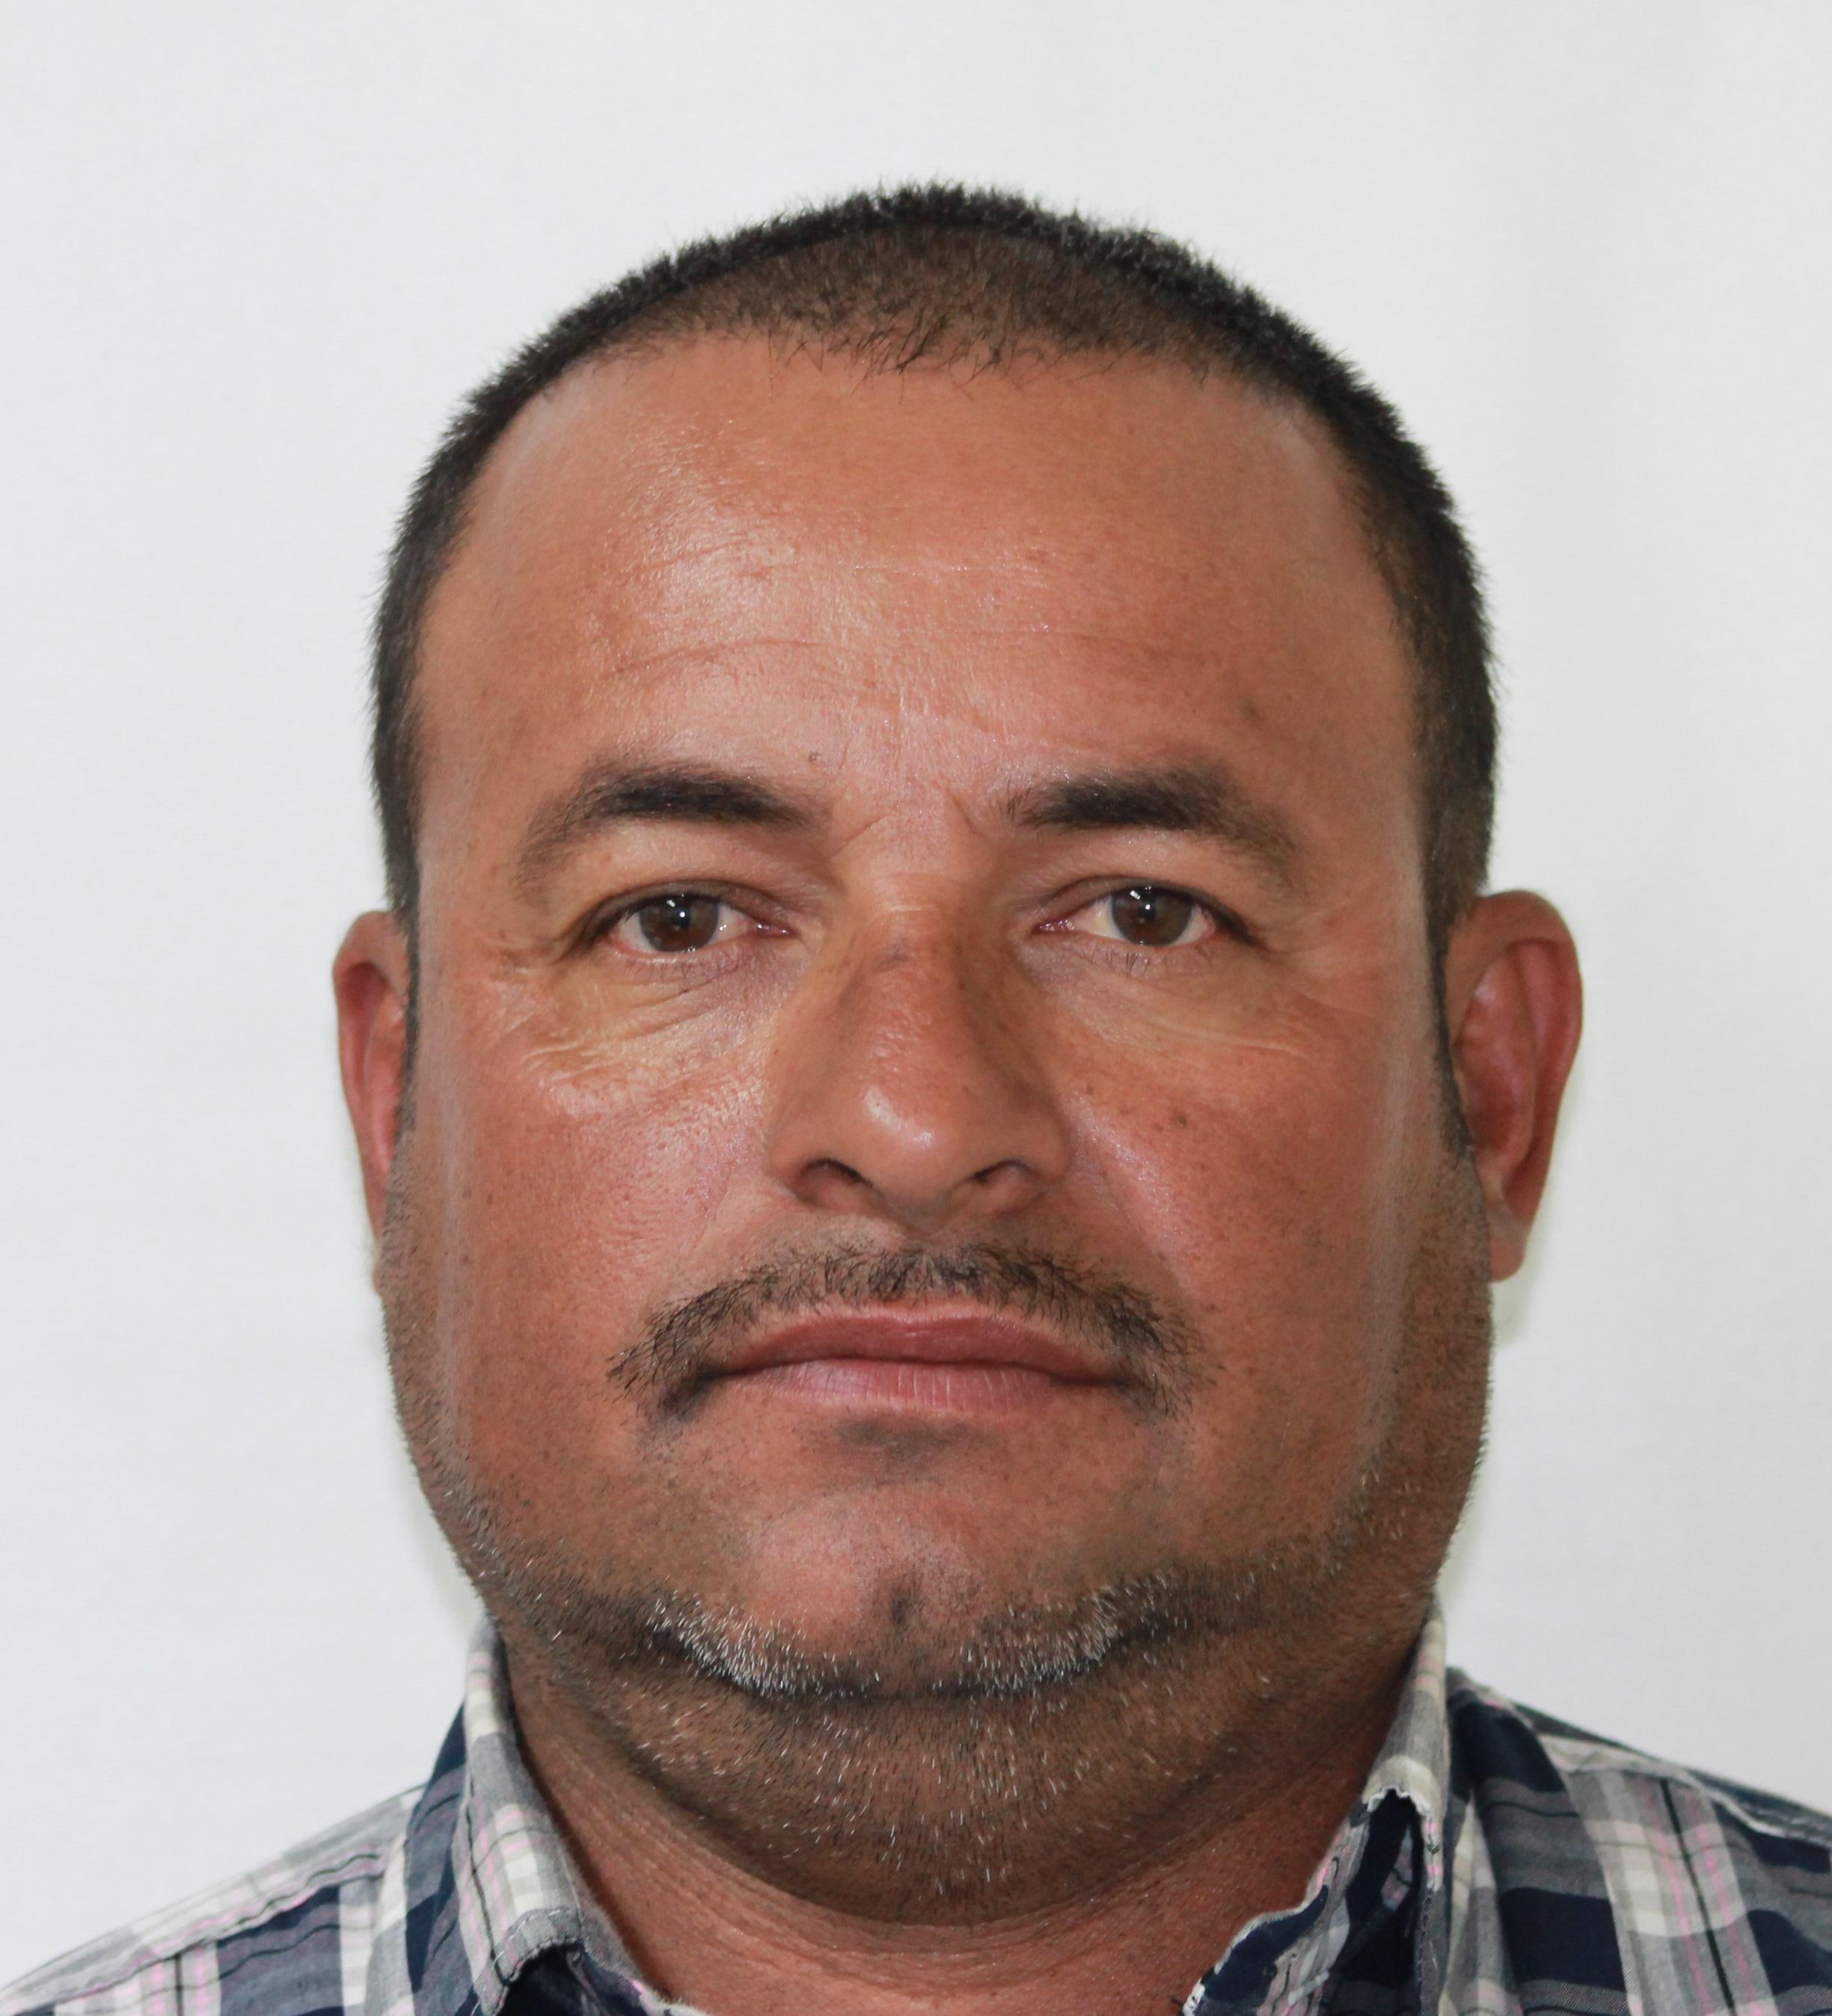 4466 MARTINEZ HUGUEZ CLAUDIO ELISEO